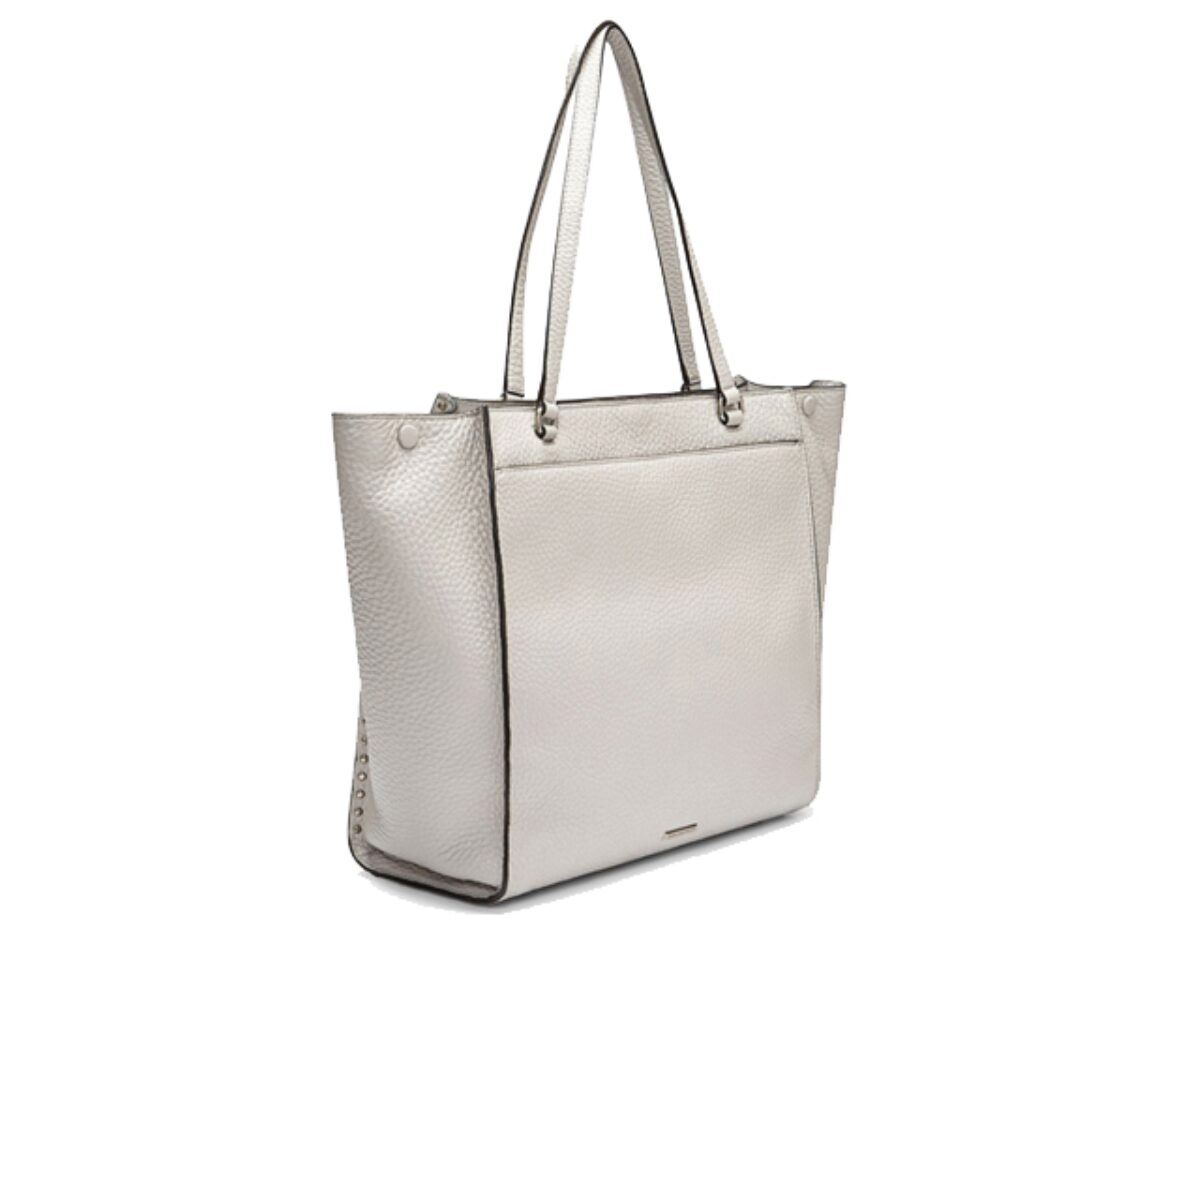 4ccc4a17b Rebecca Minkoff-DARREN Tote Bag - Putty│Samsung C&T Online Mall SSF Shop